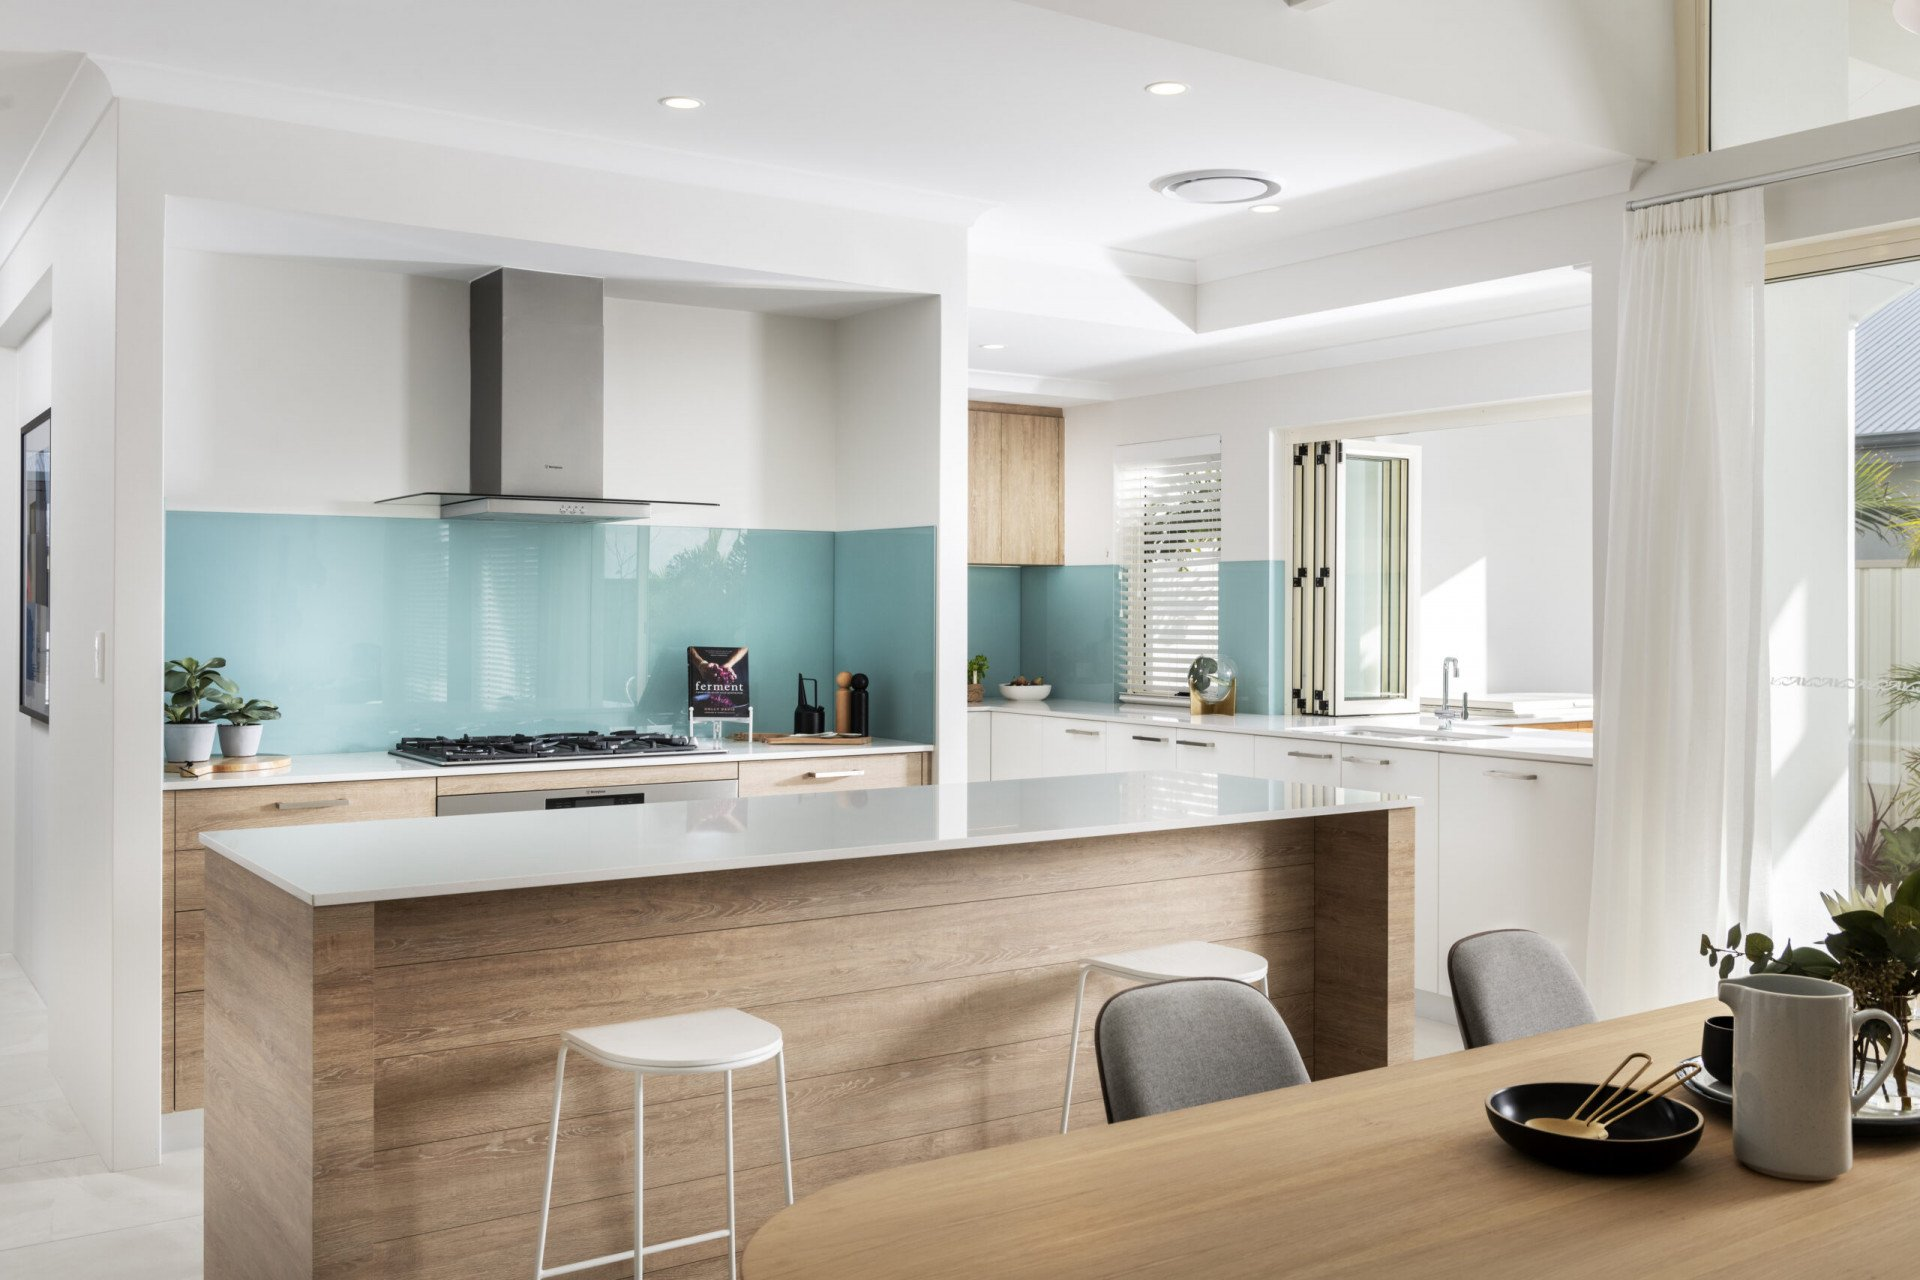 Kitchen-1-1-scaled